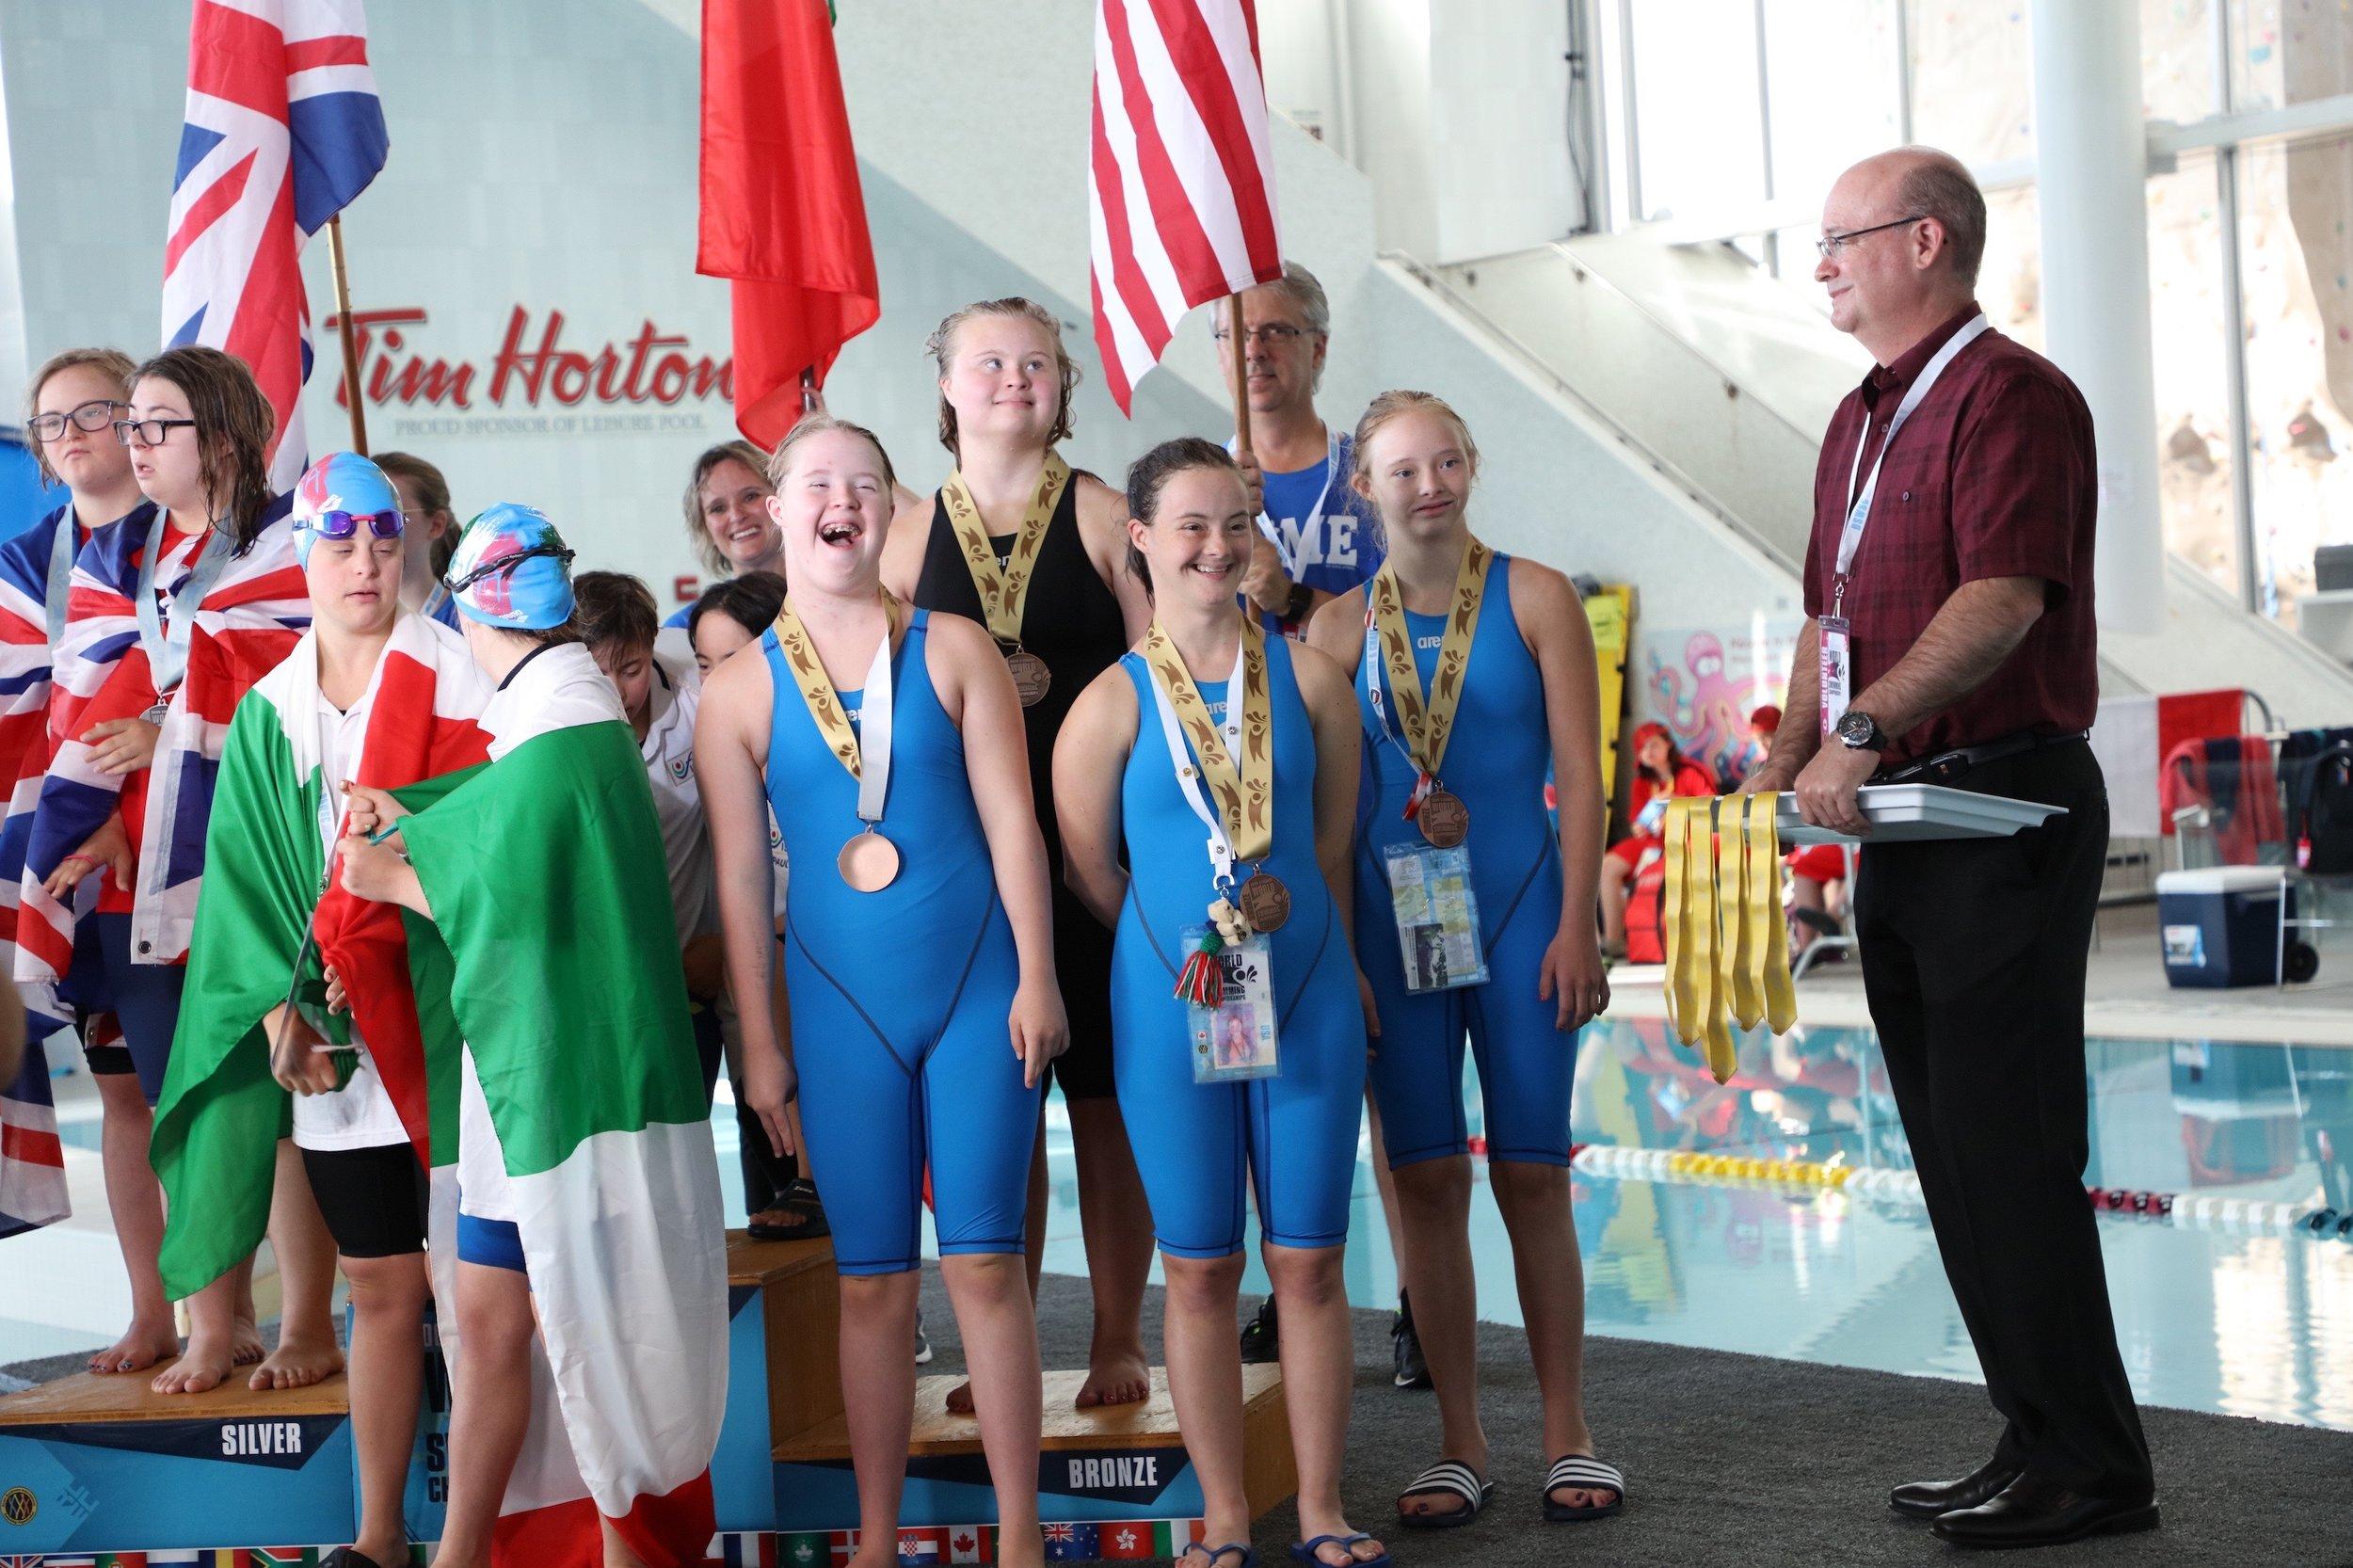 Allison Van Hoesen, Katya Vazhenin, Mary Borman, Maggie Scherder - Blue Springs, MO, Larenceville, GA, Fayetteville, AK, & Peoria, ILBRONZE - Women's 200 Free Relay2018 DSISO World Swim Championships - Nova Scotia, Canada